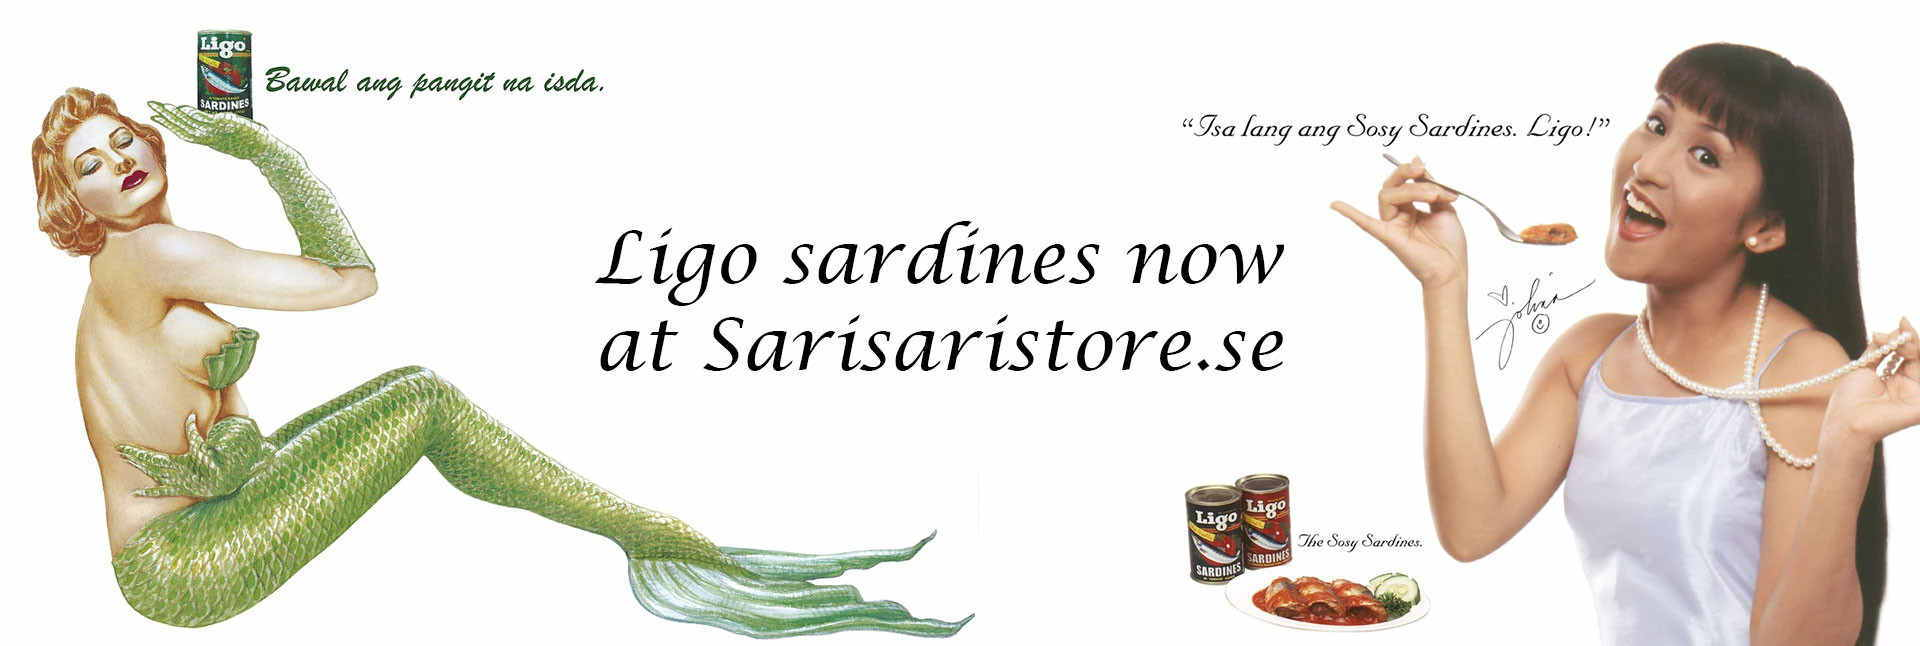 Ligo sardines, yummy!